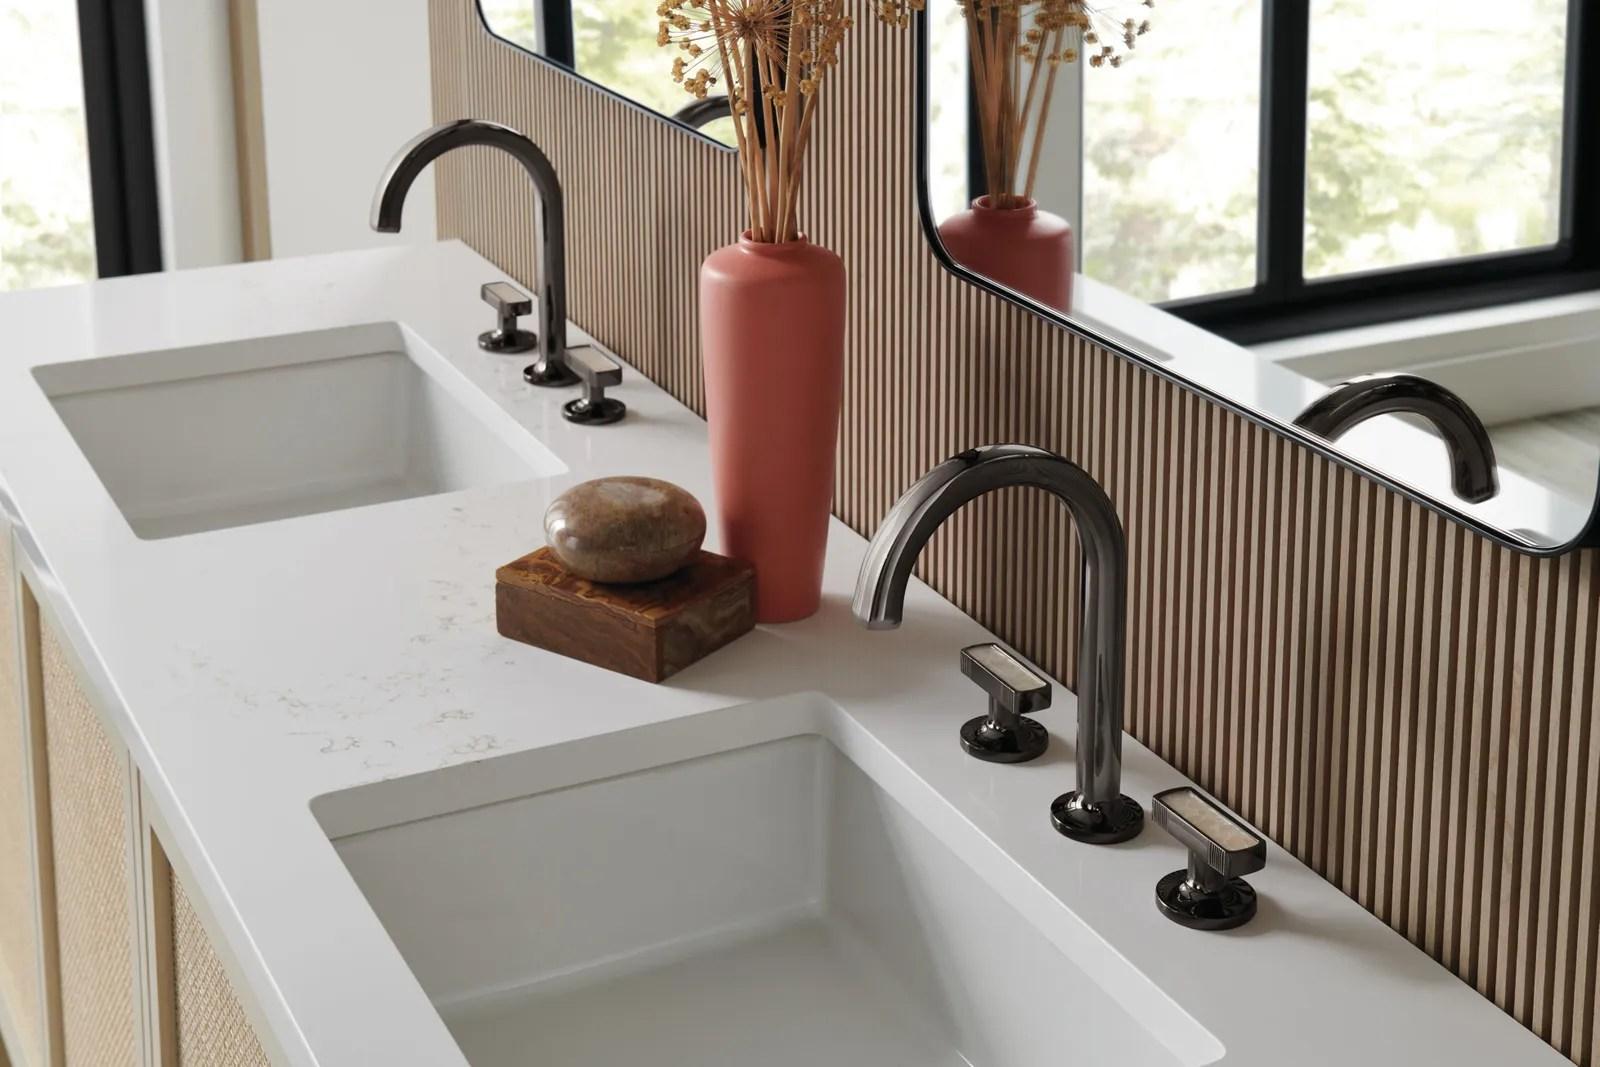 kbis 2020 5 kitchen and bath trends